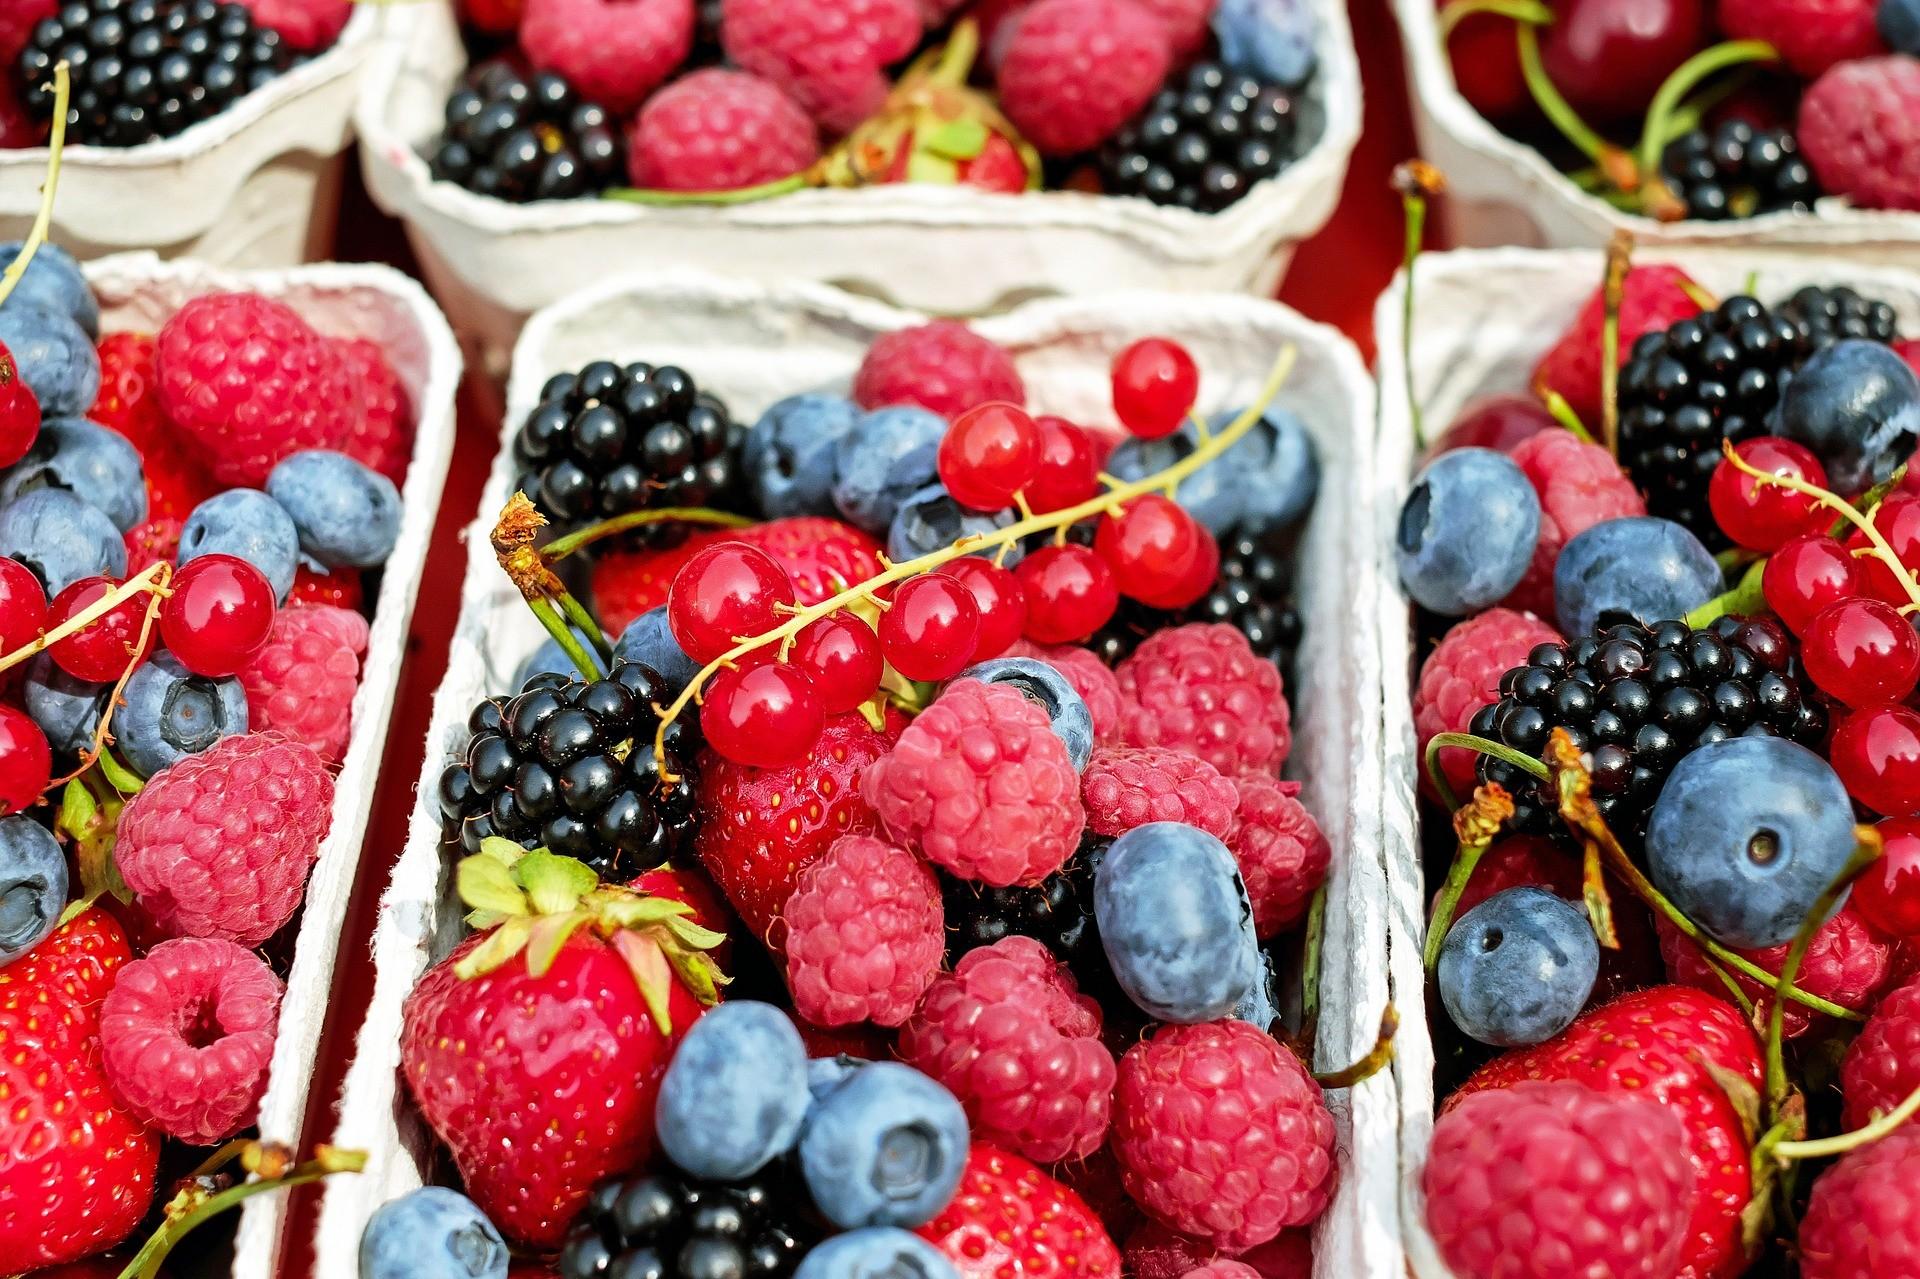 "<p>Фото © <a href=""https://pixabay.com/photos/berries-raspberries-fruit-fruits-1546125/"" target=""_self"">Pixabay</a></p>"